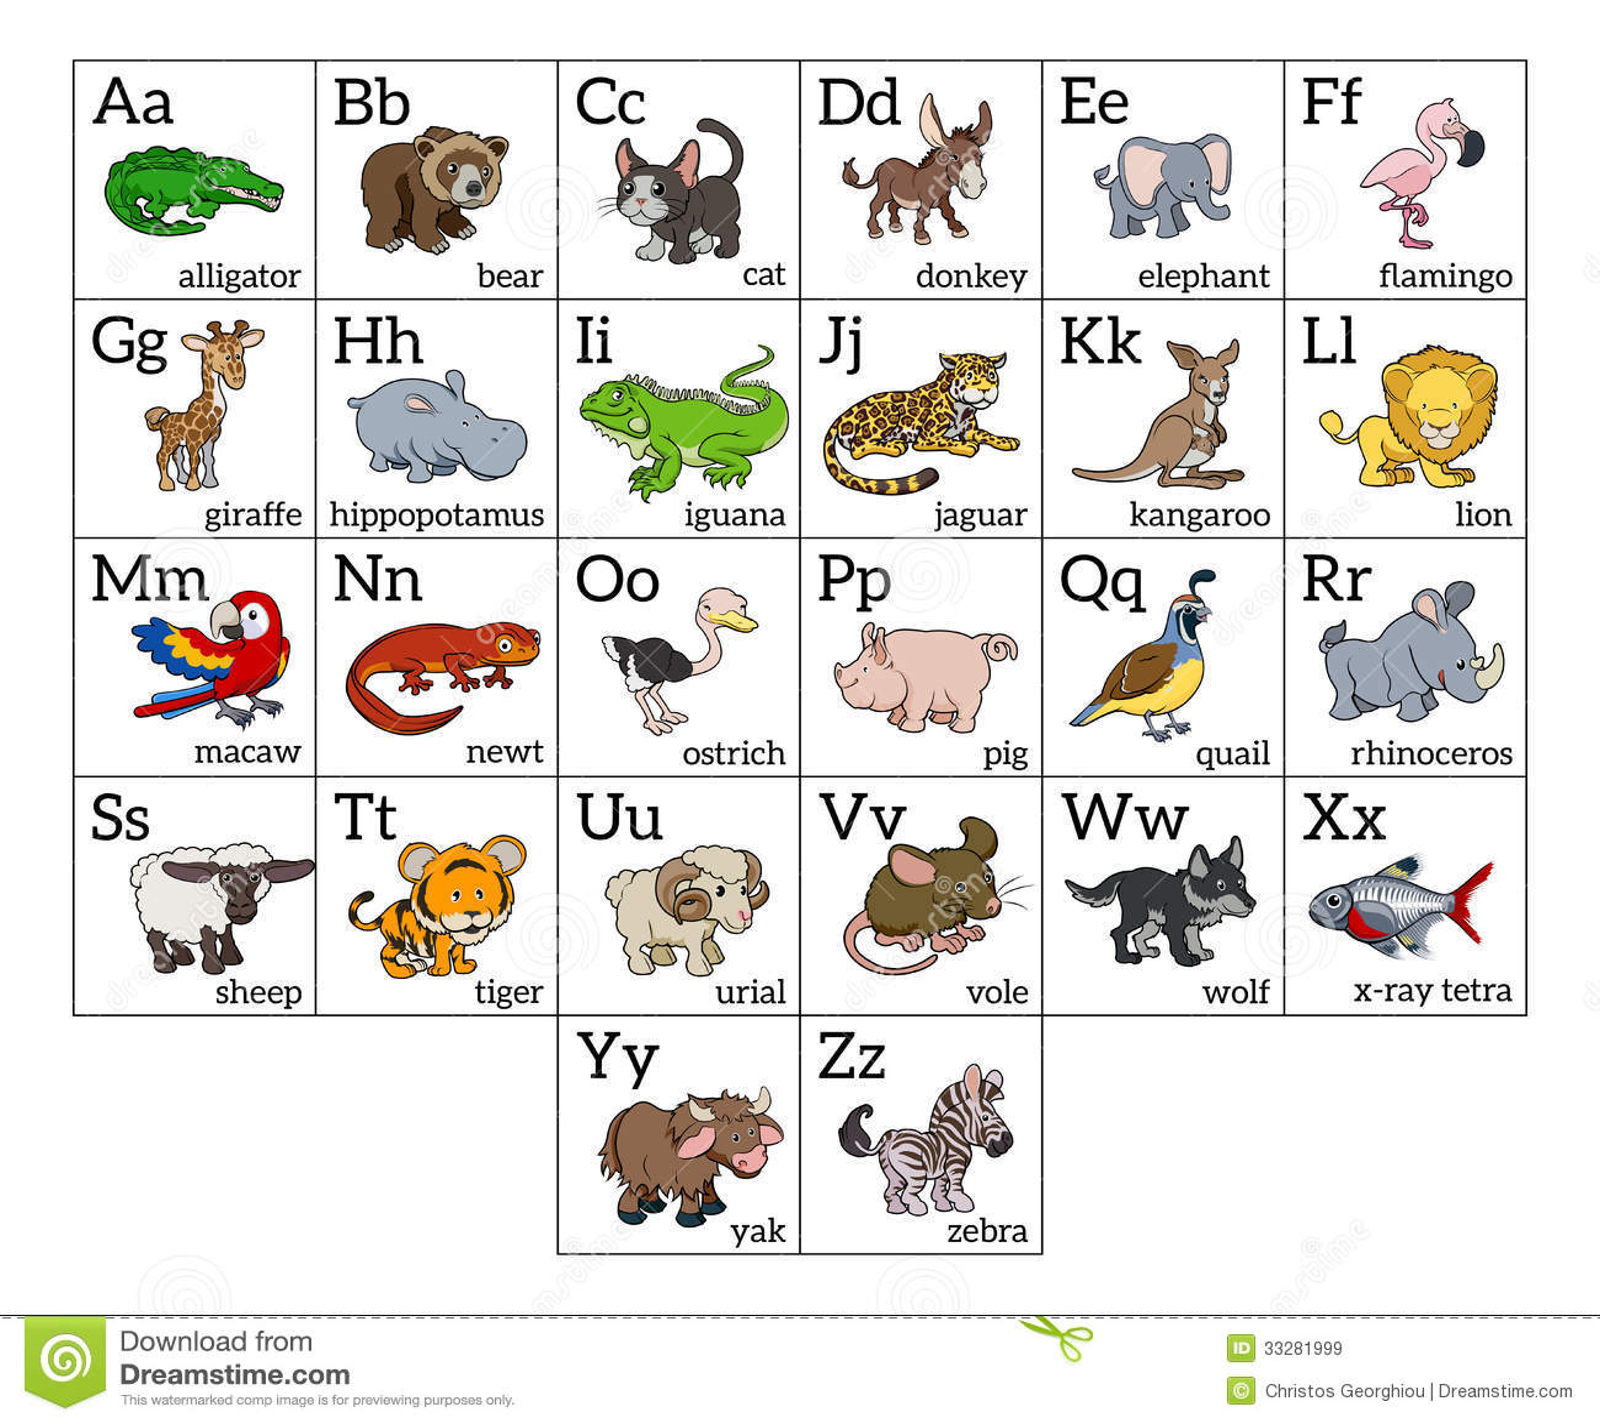 Diagramme Animal Dalphabet De Bande Dessin  e Images libres de droits xDIM53zH